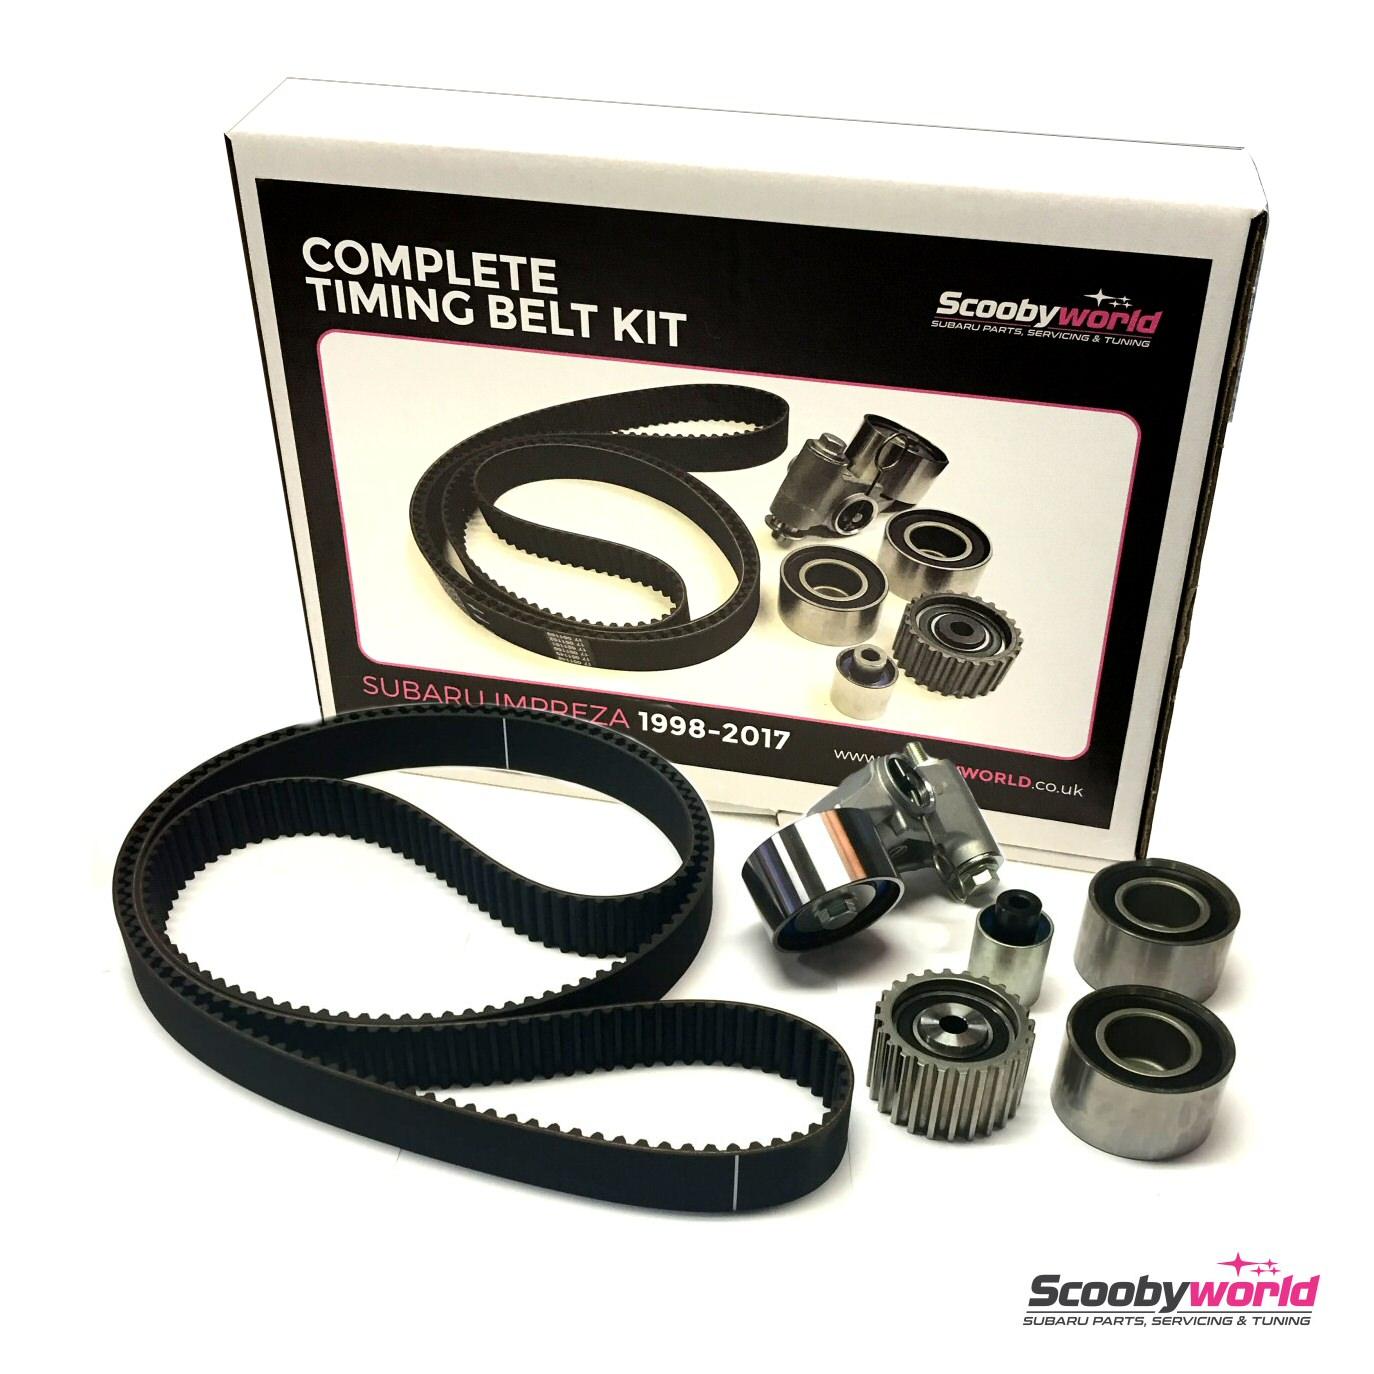 Servicing Parts Subaru Wrx Sti Performance Scoobyworld Timing Belt For Legacy Impreza Complete Cambelt Kit 1998 2012